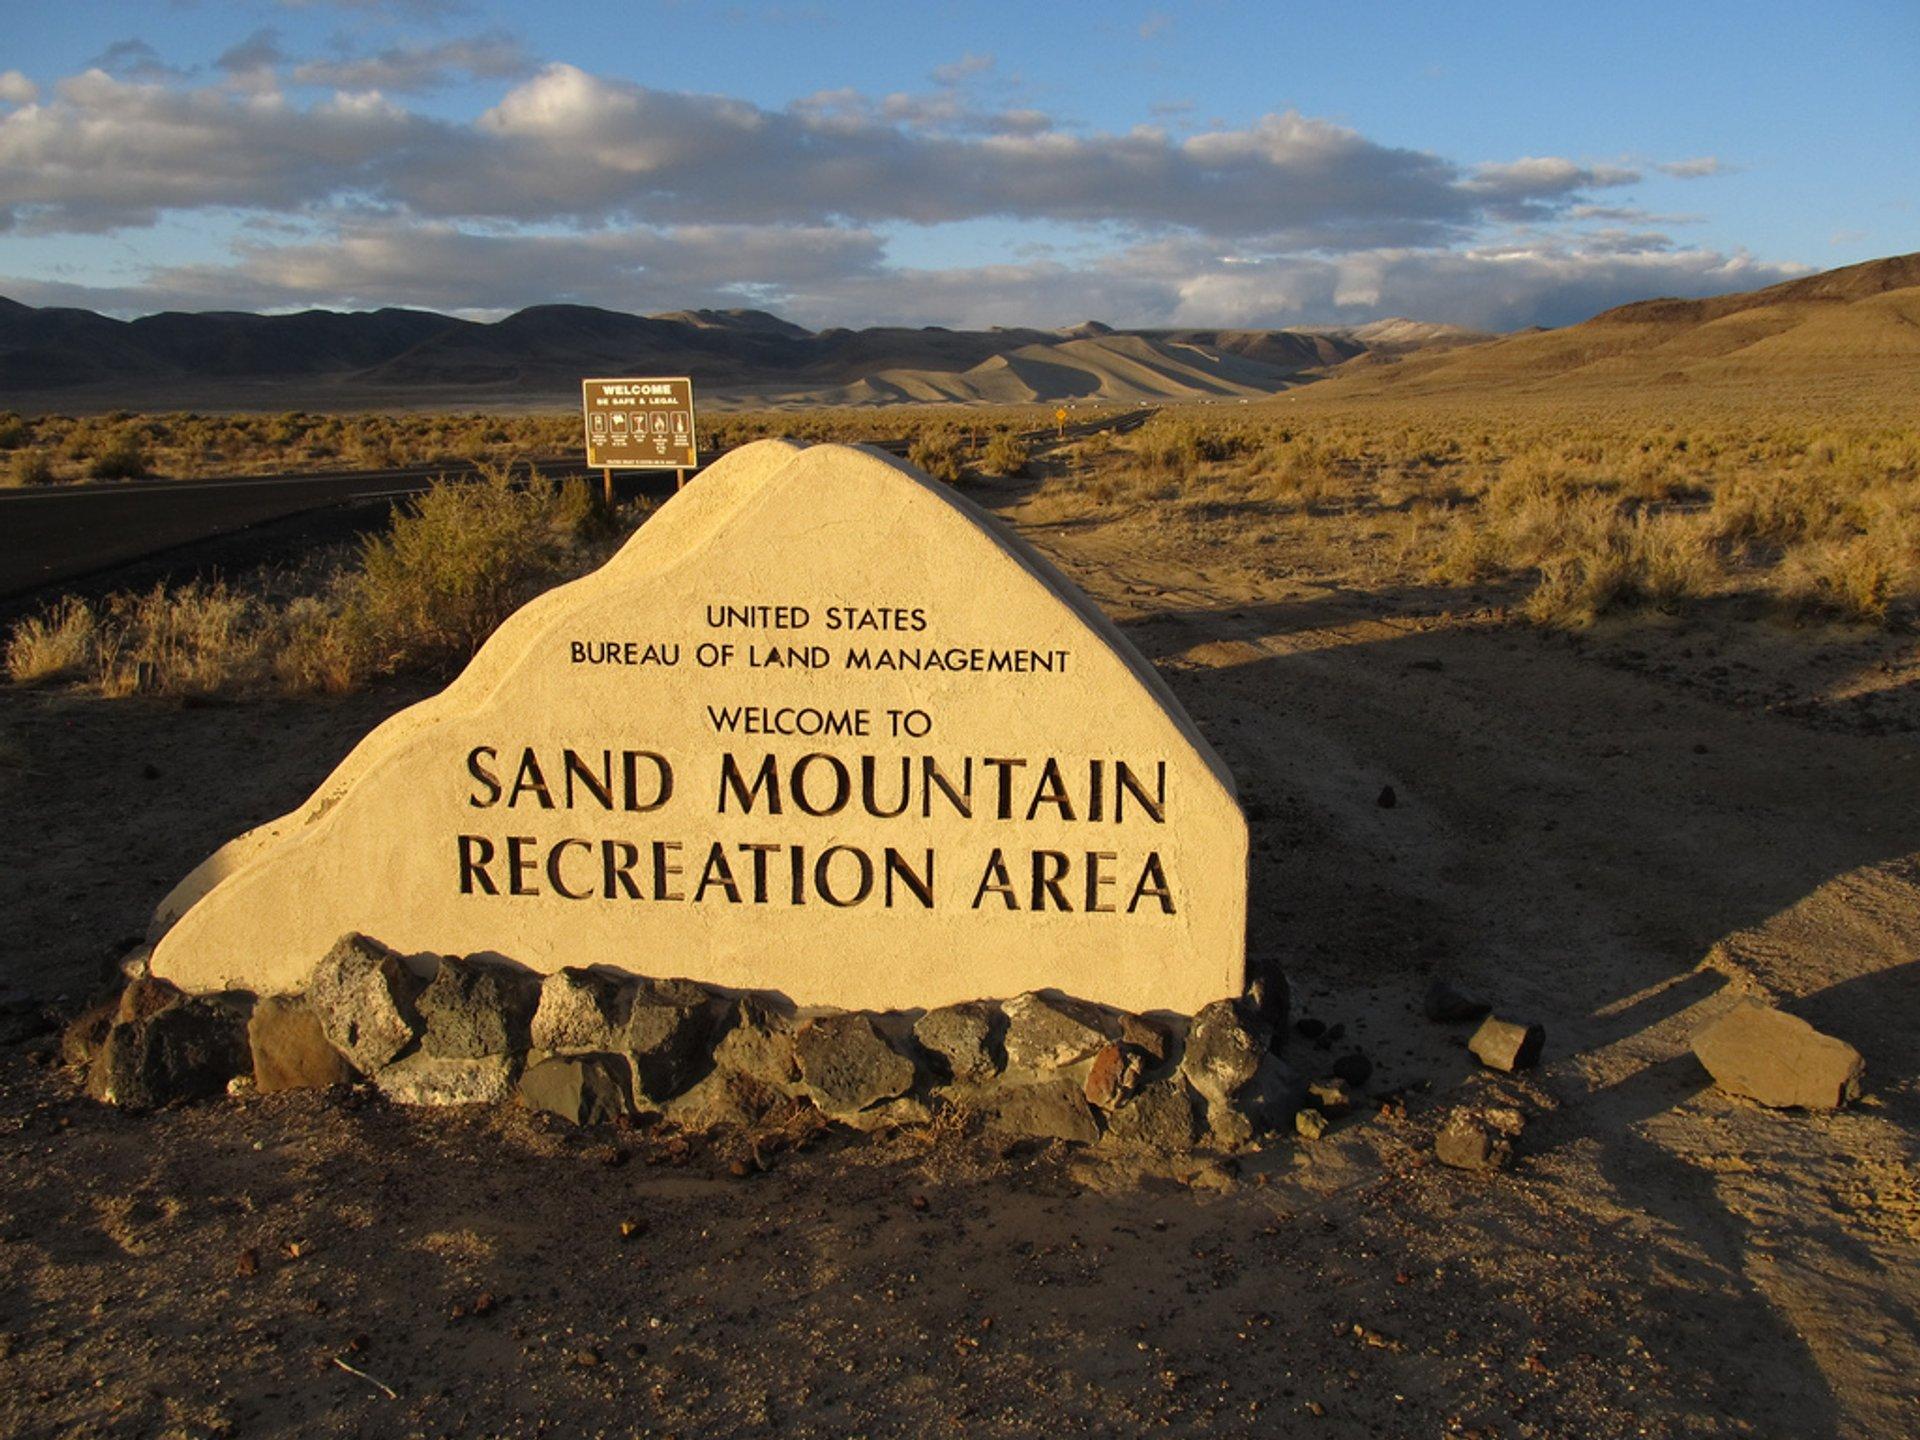 Spring mountain ranch state park Sandberg In Nevada 2021